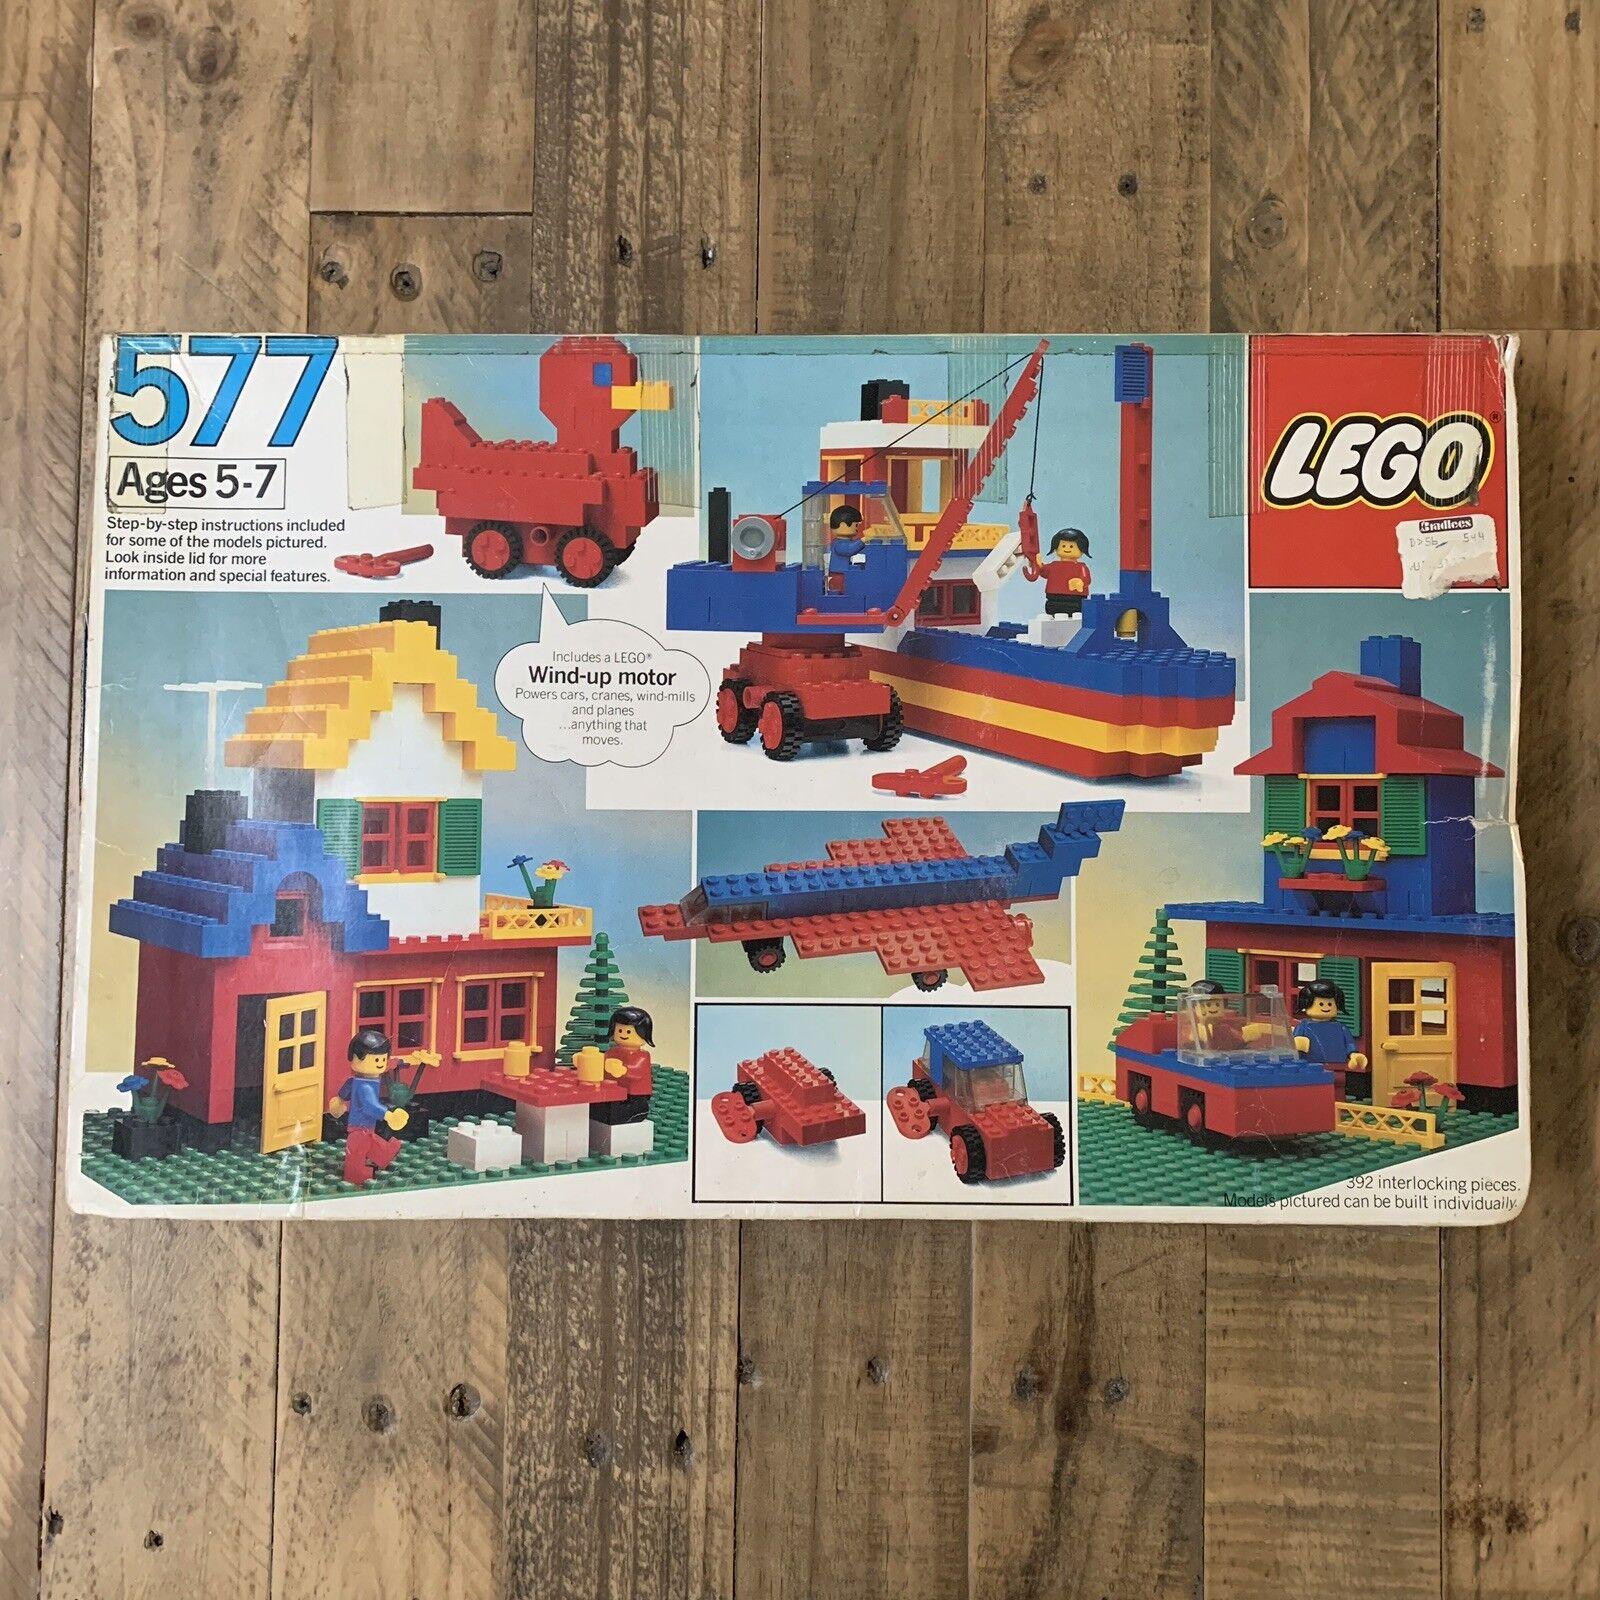 Vintage Lego set 577 Basic Building Set 1983 392 Pieces Minifigs Wind Up Motor